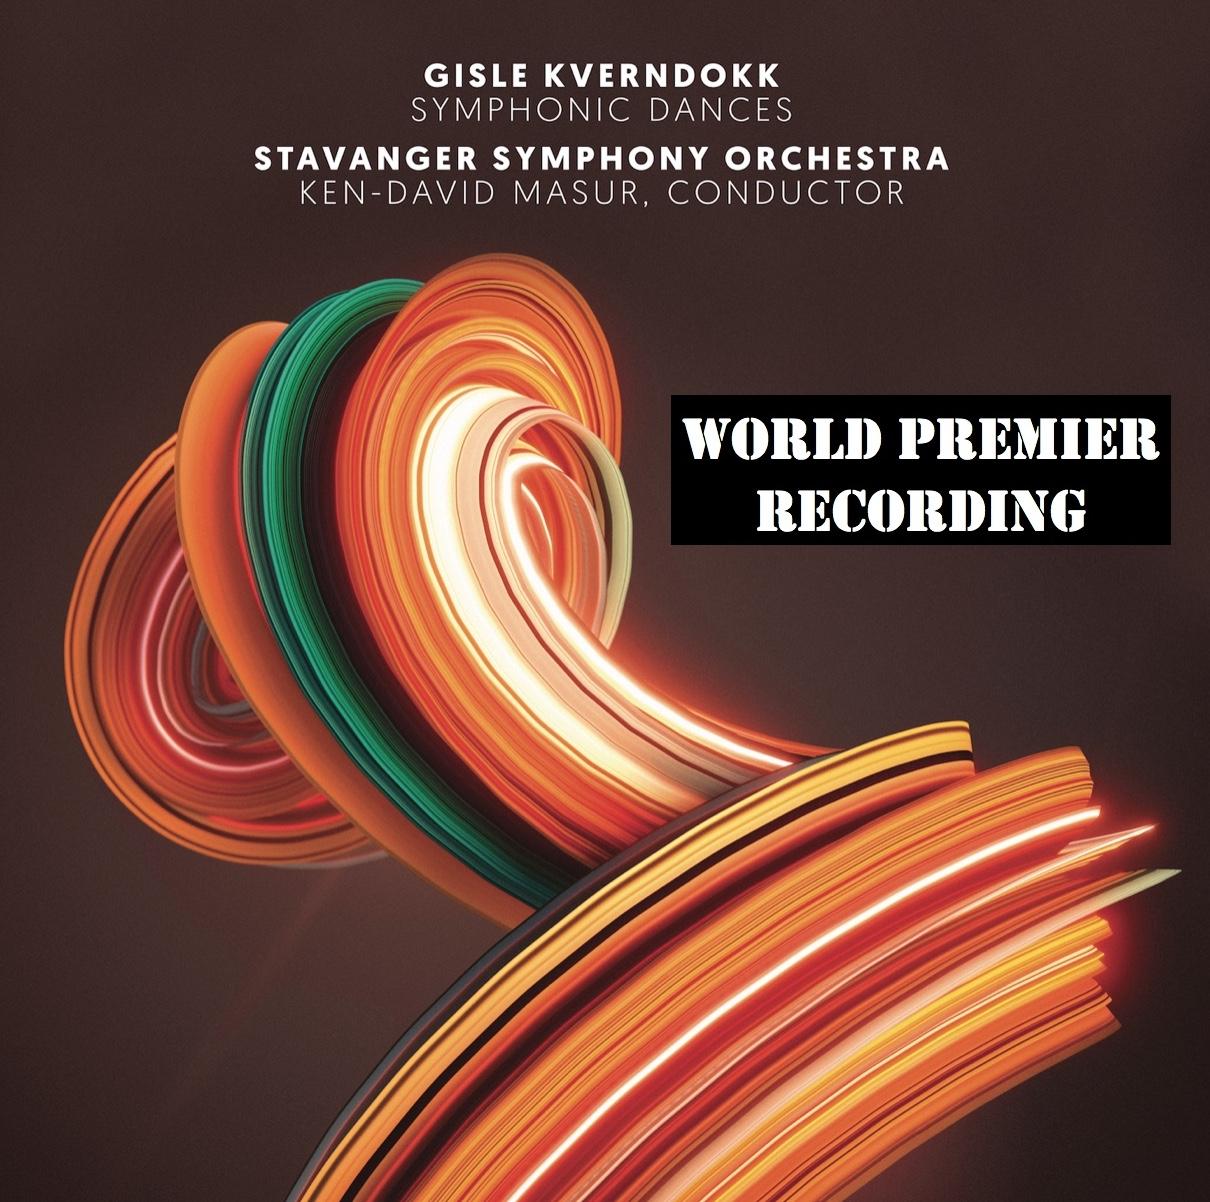 "World Premier Recording  - Gisle Kverndokk's ""Symphonic Dances"" - Stavanger Symphony Orchestra conducted by Ken-David Masur"